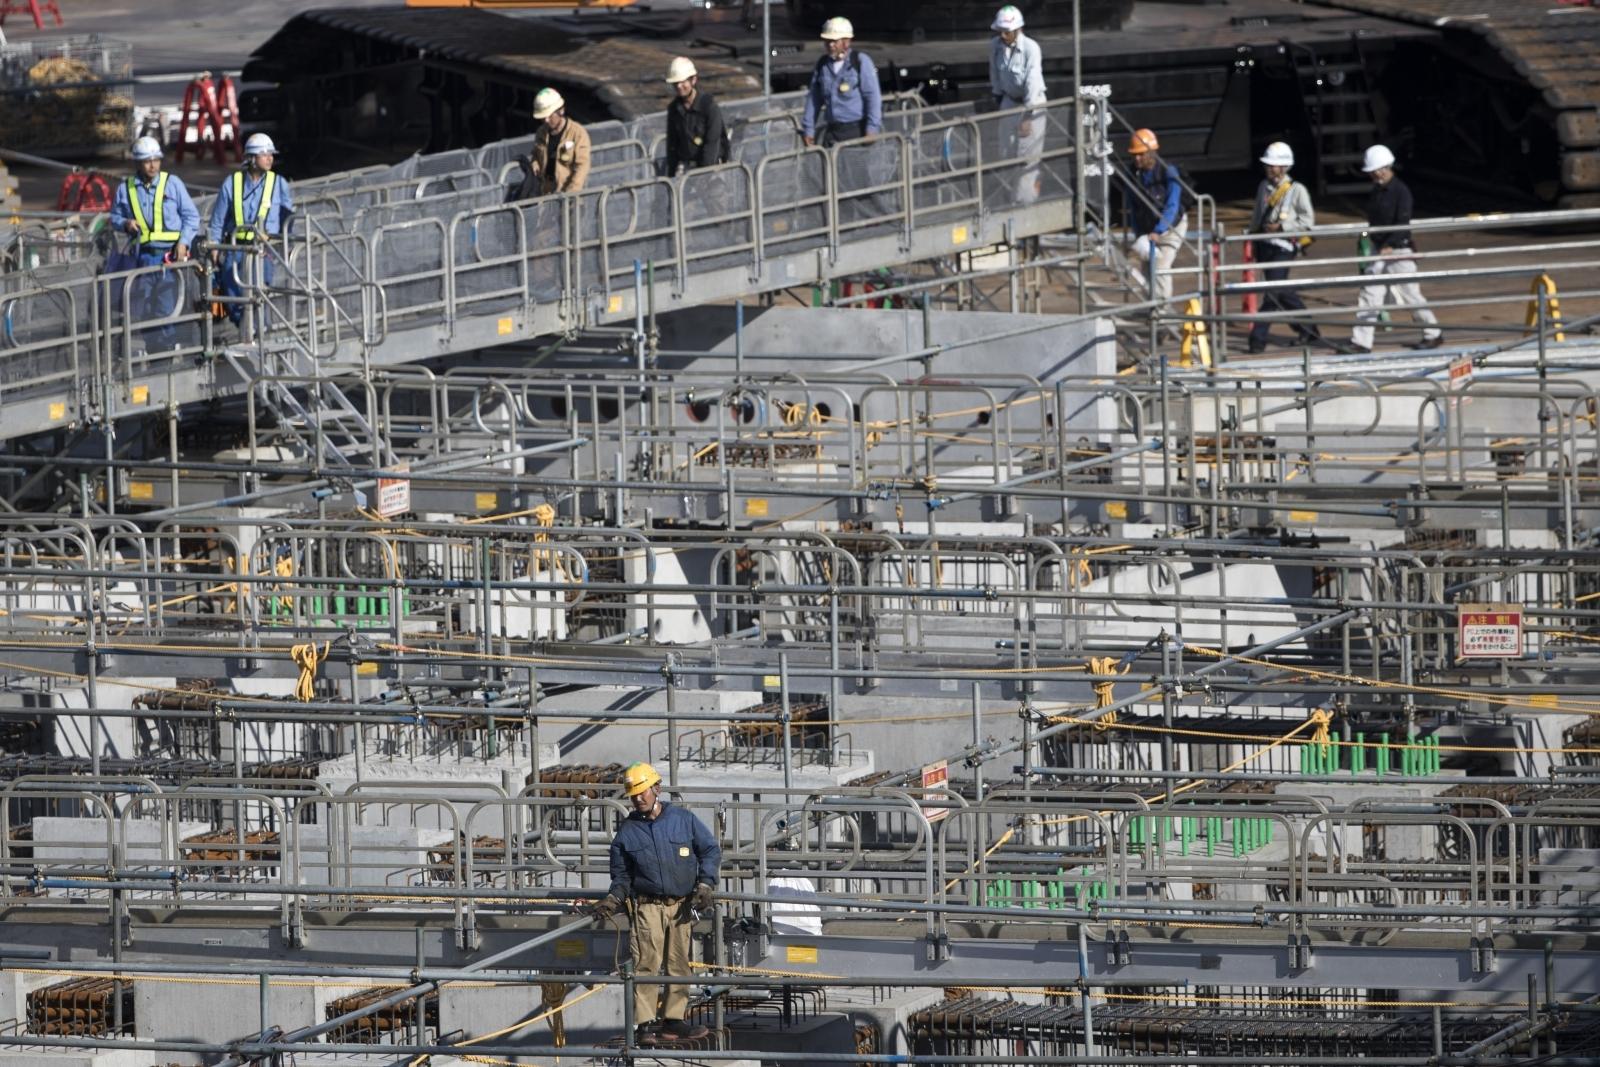 Olympic stadium Japan